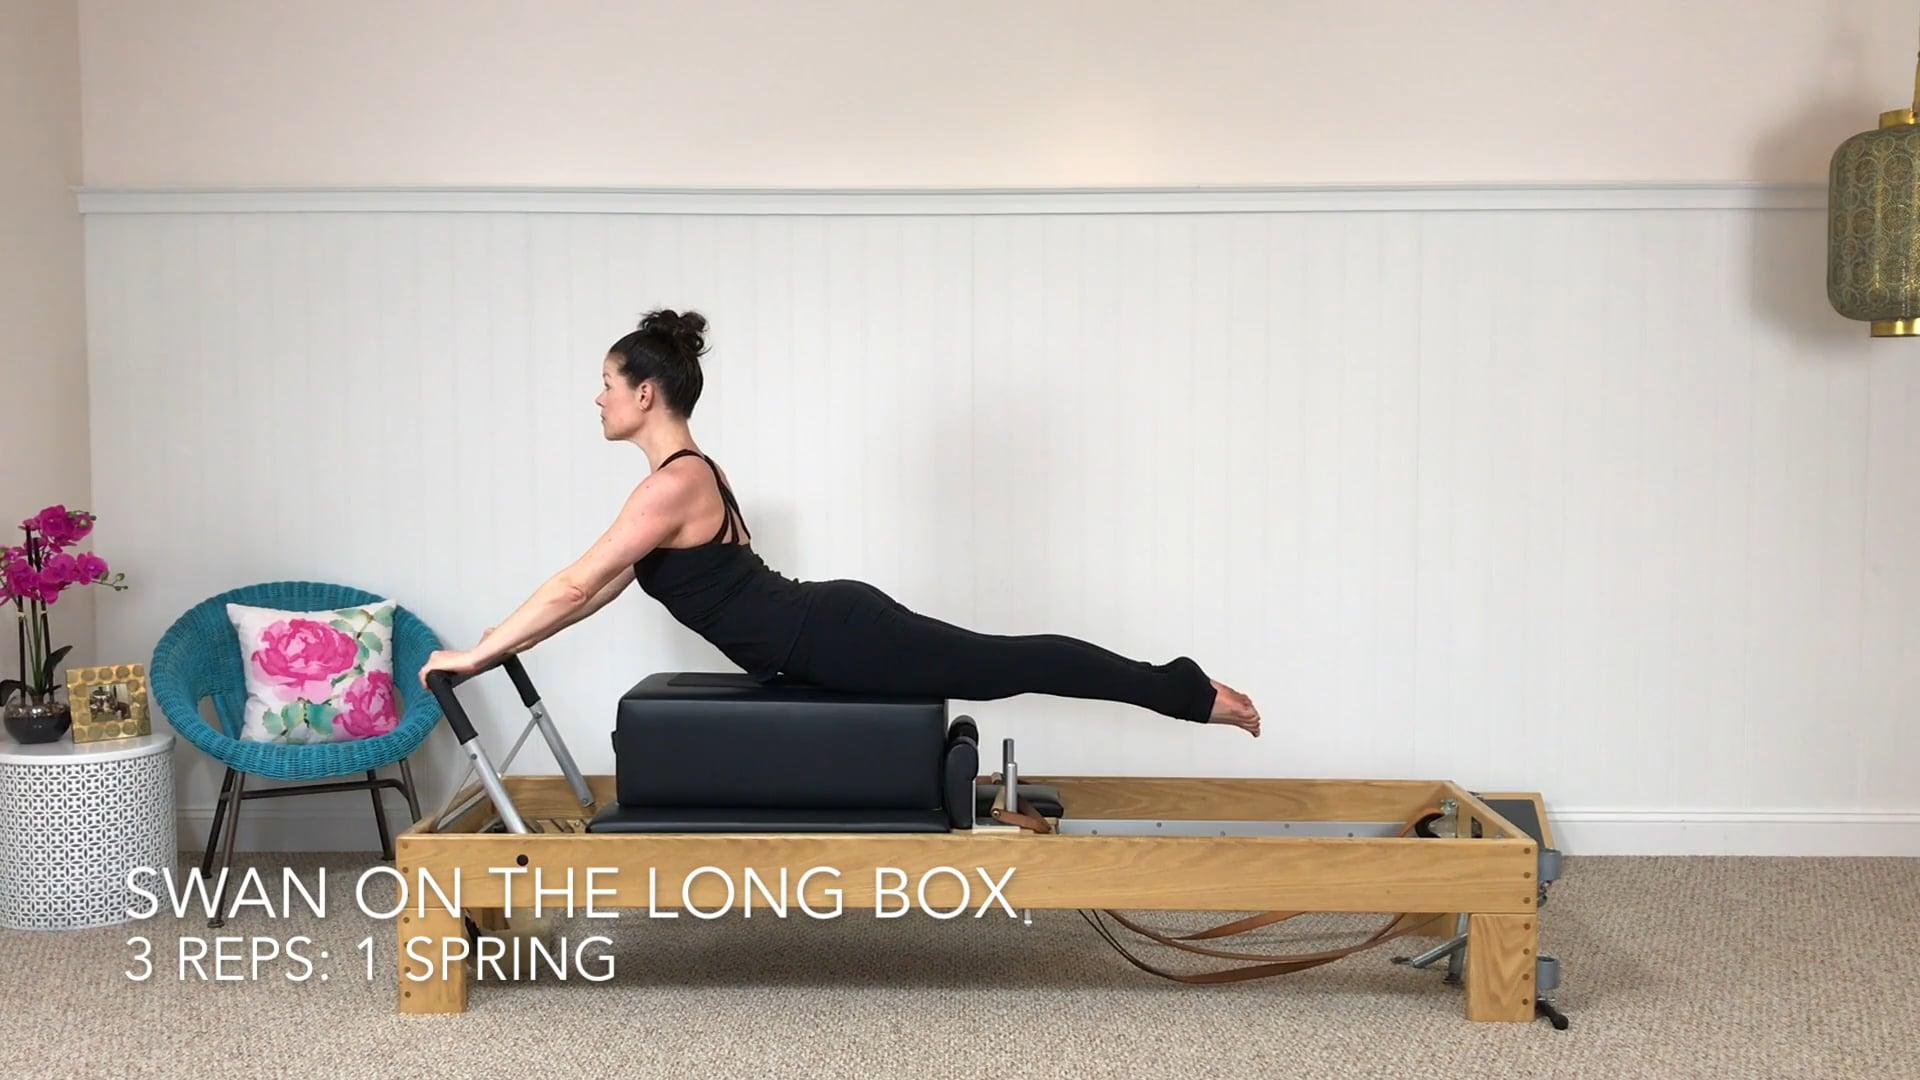 Swan on the Long Box